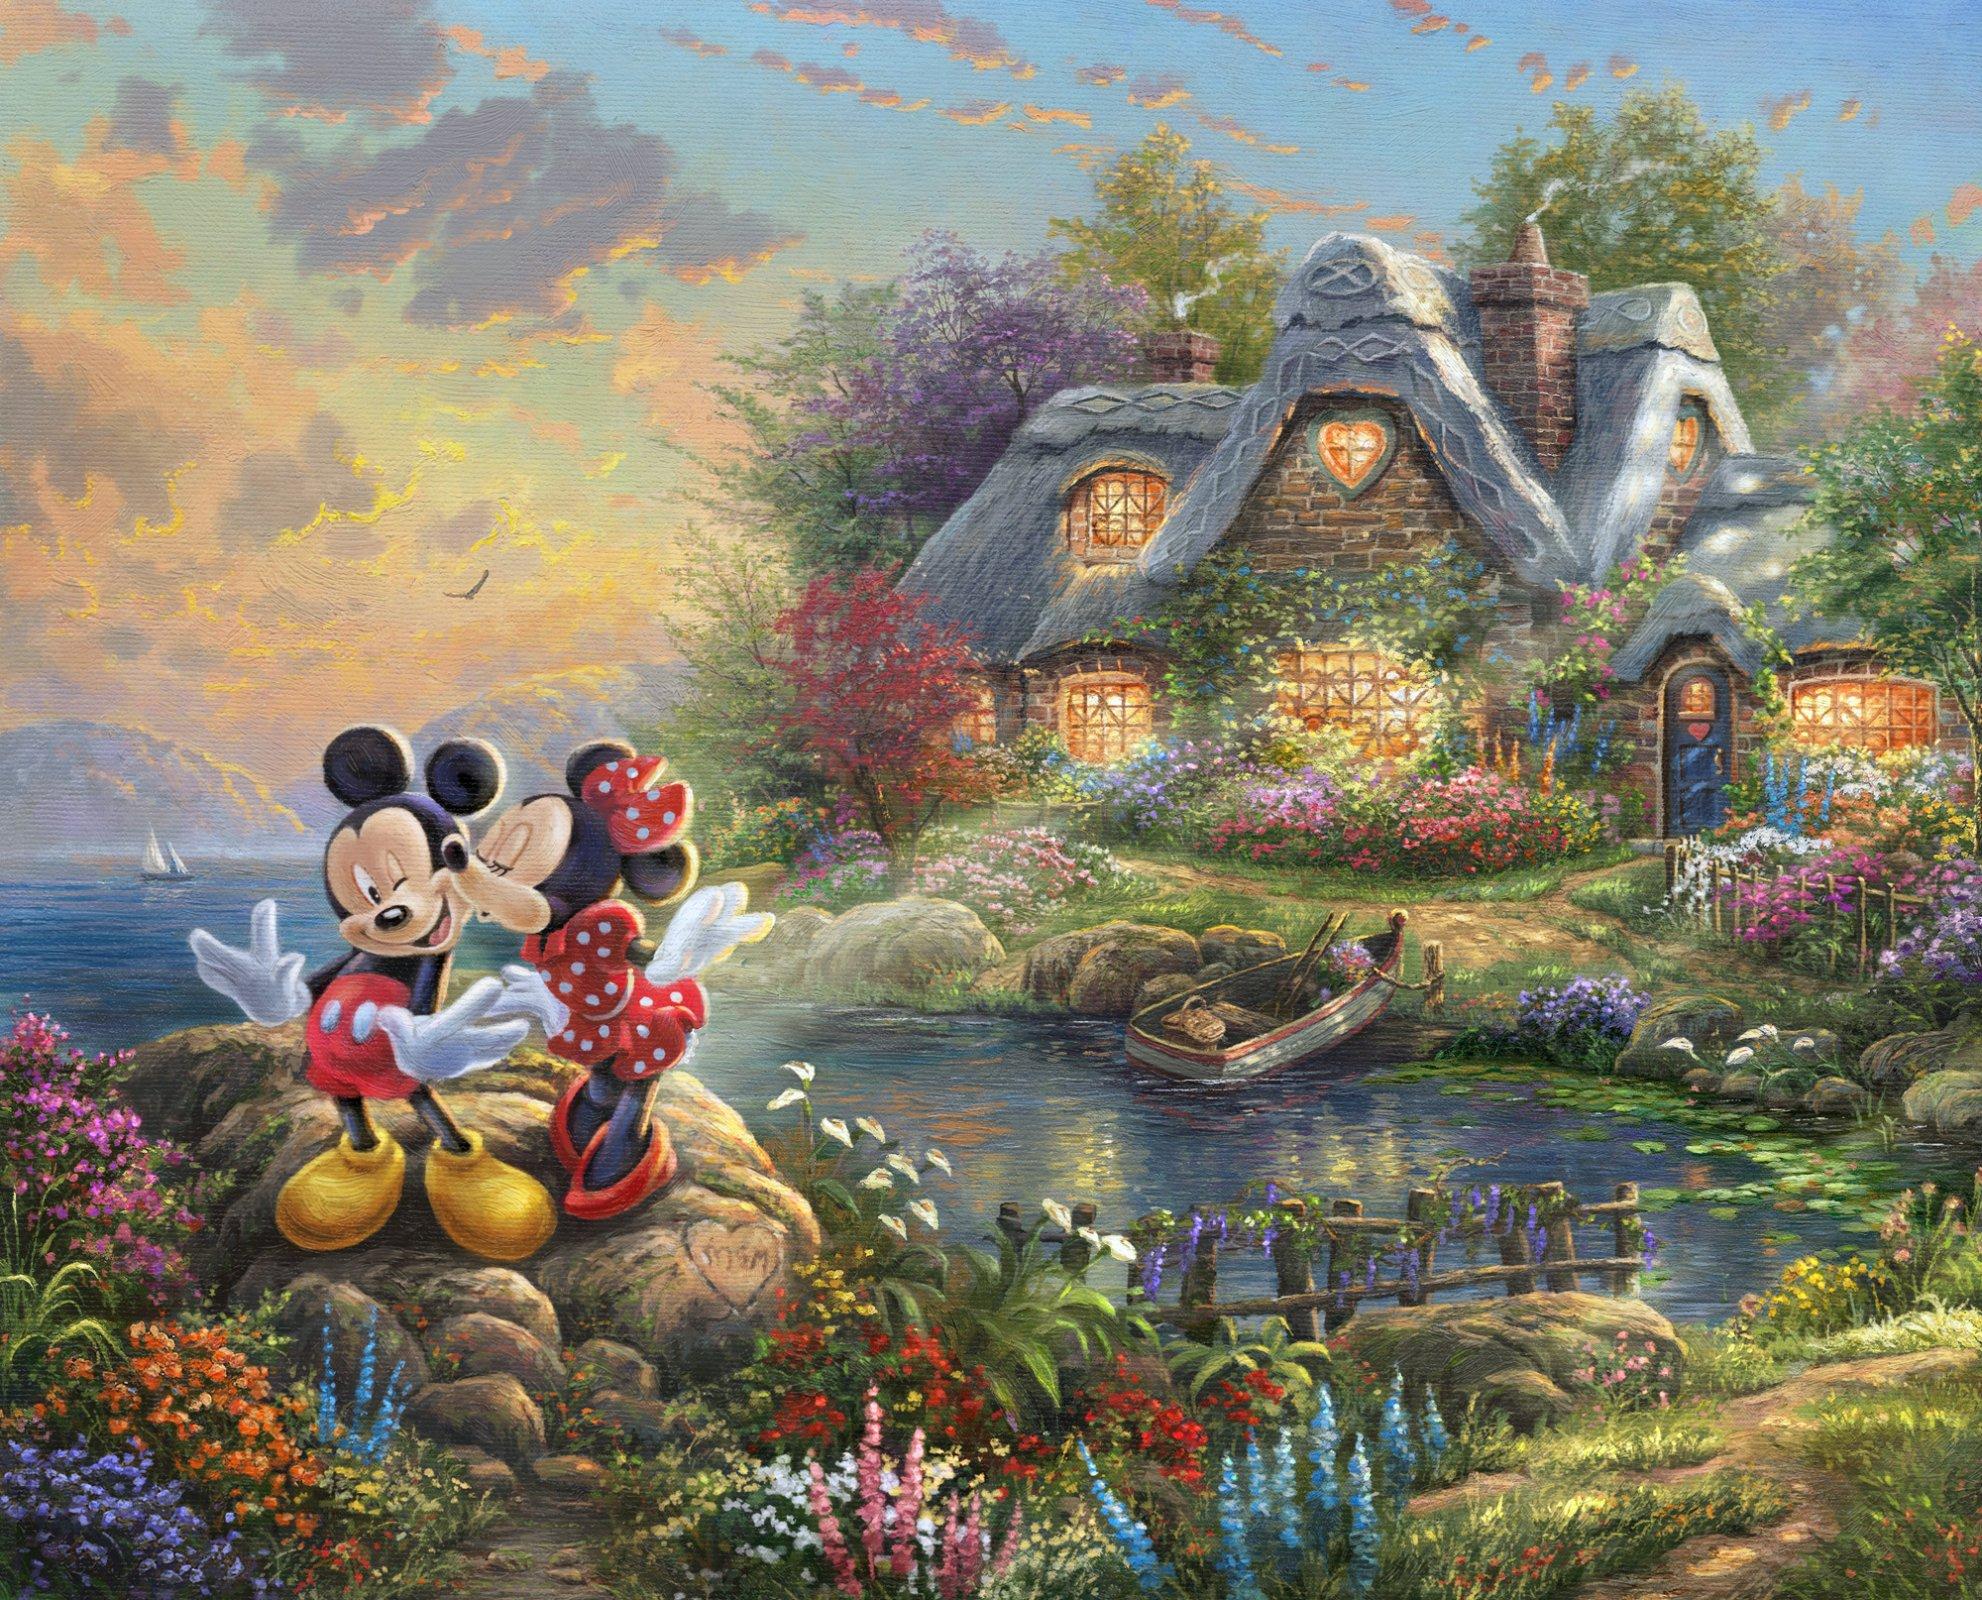 DT-Disney Dreams DS-2022-9C-1 Sweetheart Cove Panel (35.5 x 44)